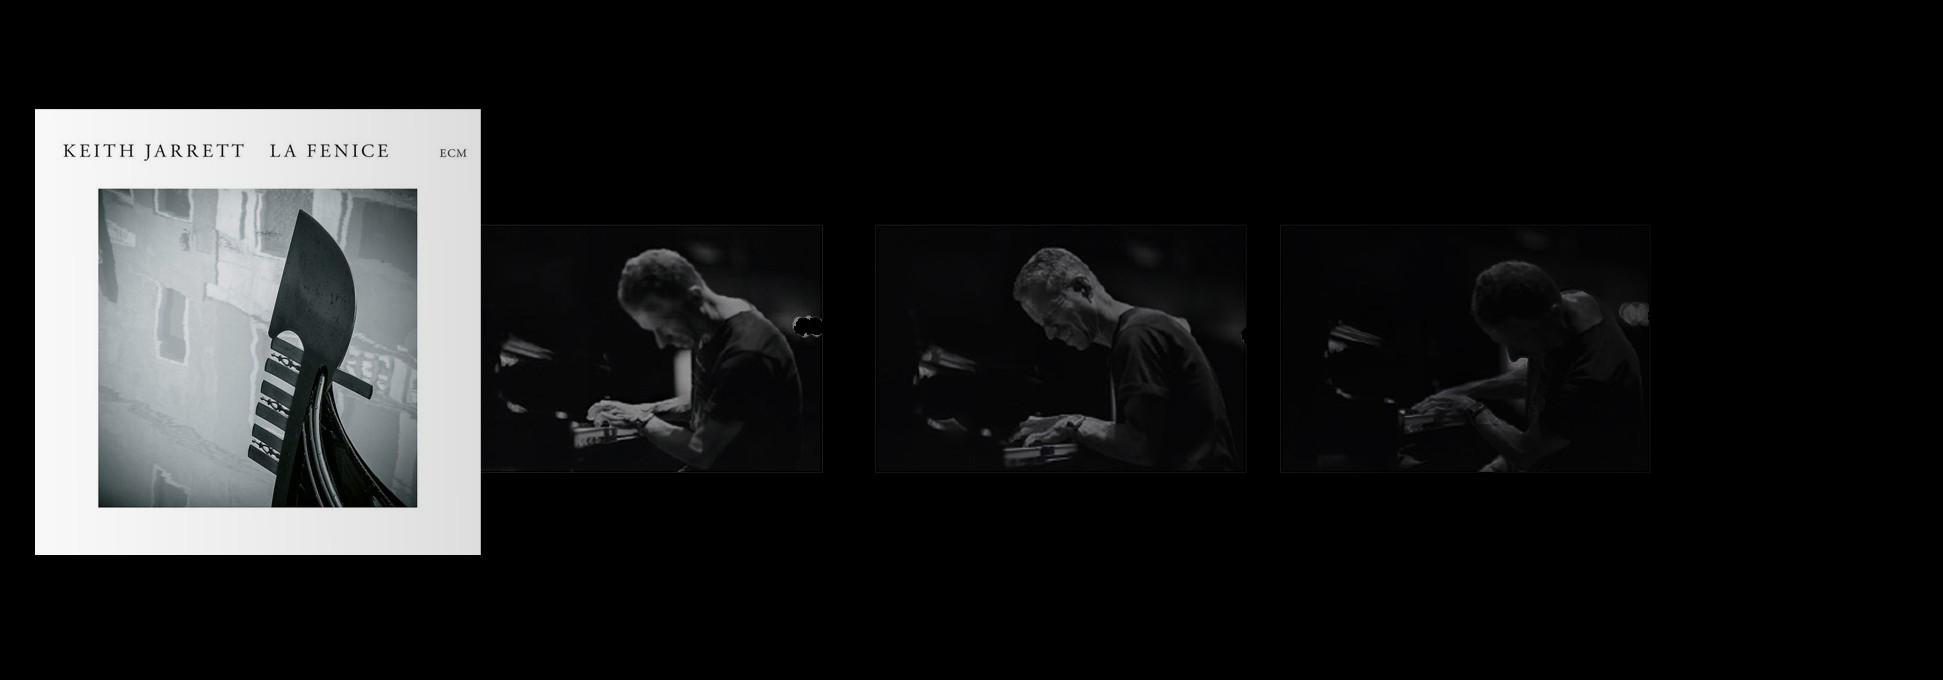 Keith Jarrett - La Fenice 2006